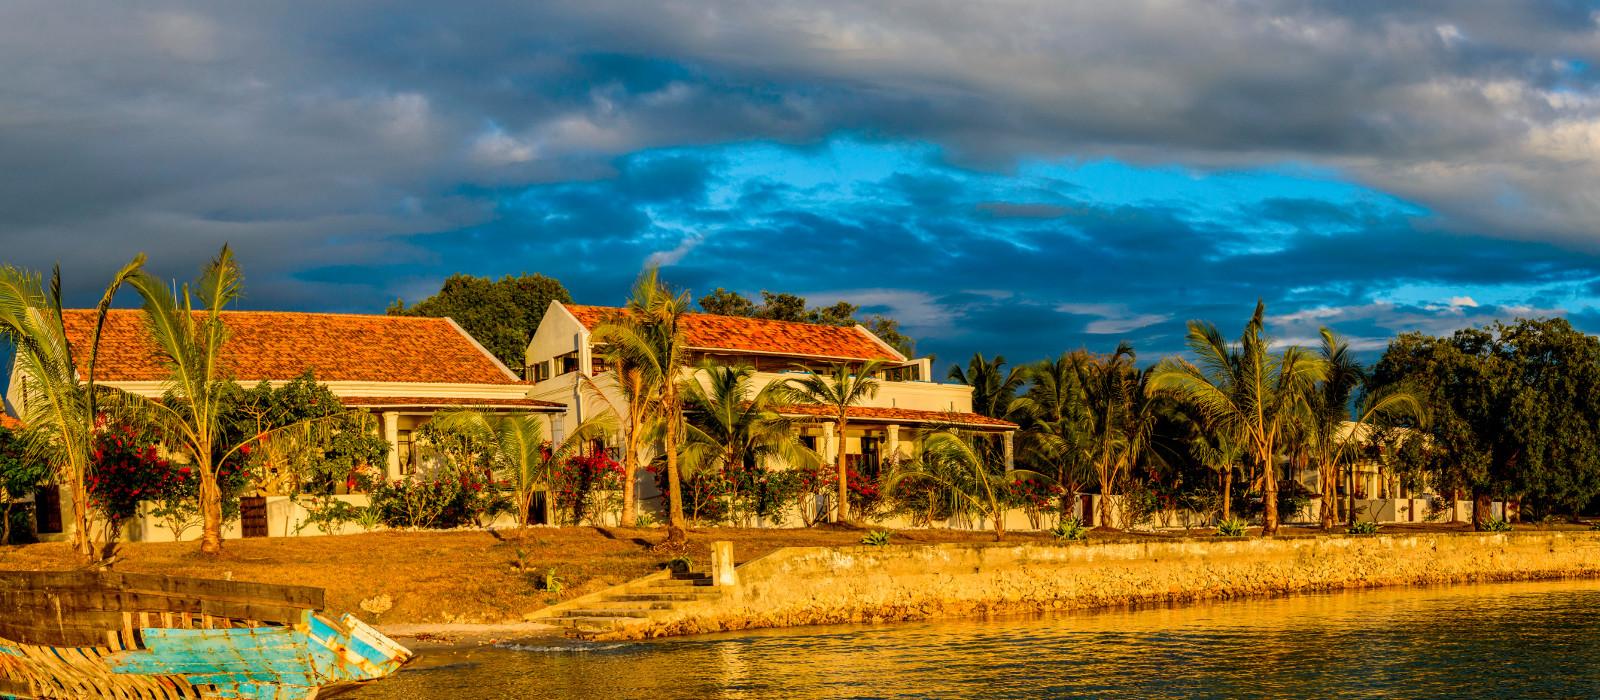 Hotel Ibo Island Lodge Mozambique